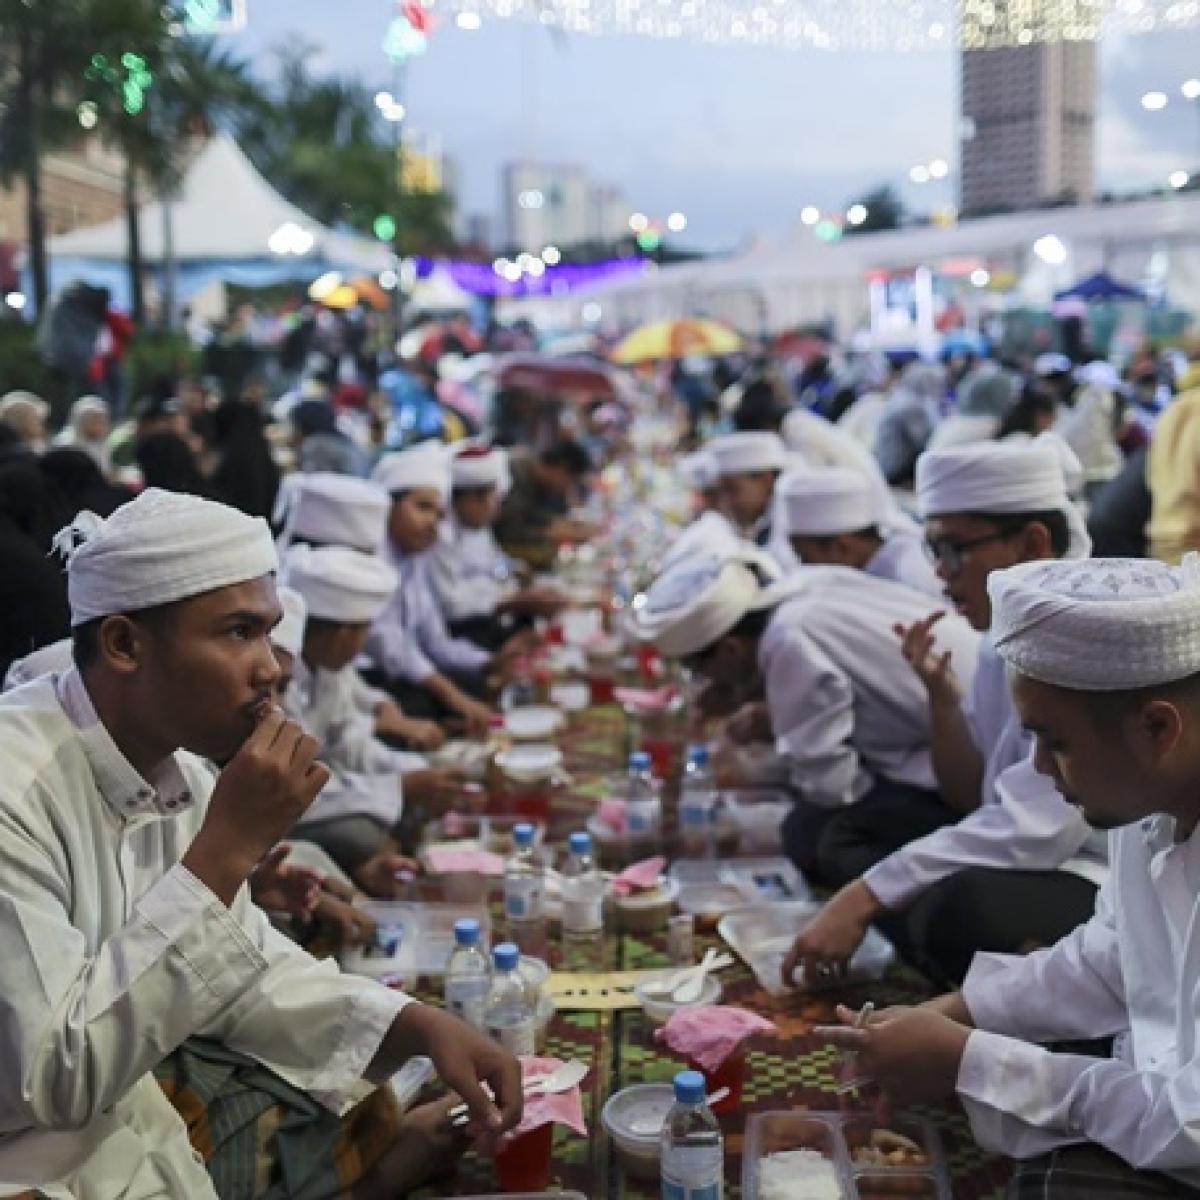 Ramadan 2020: New York City to provide 5,00,000 free halal meals